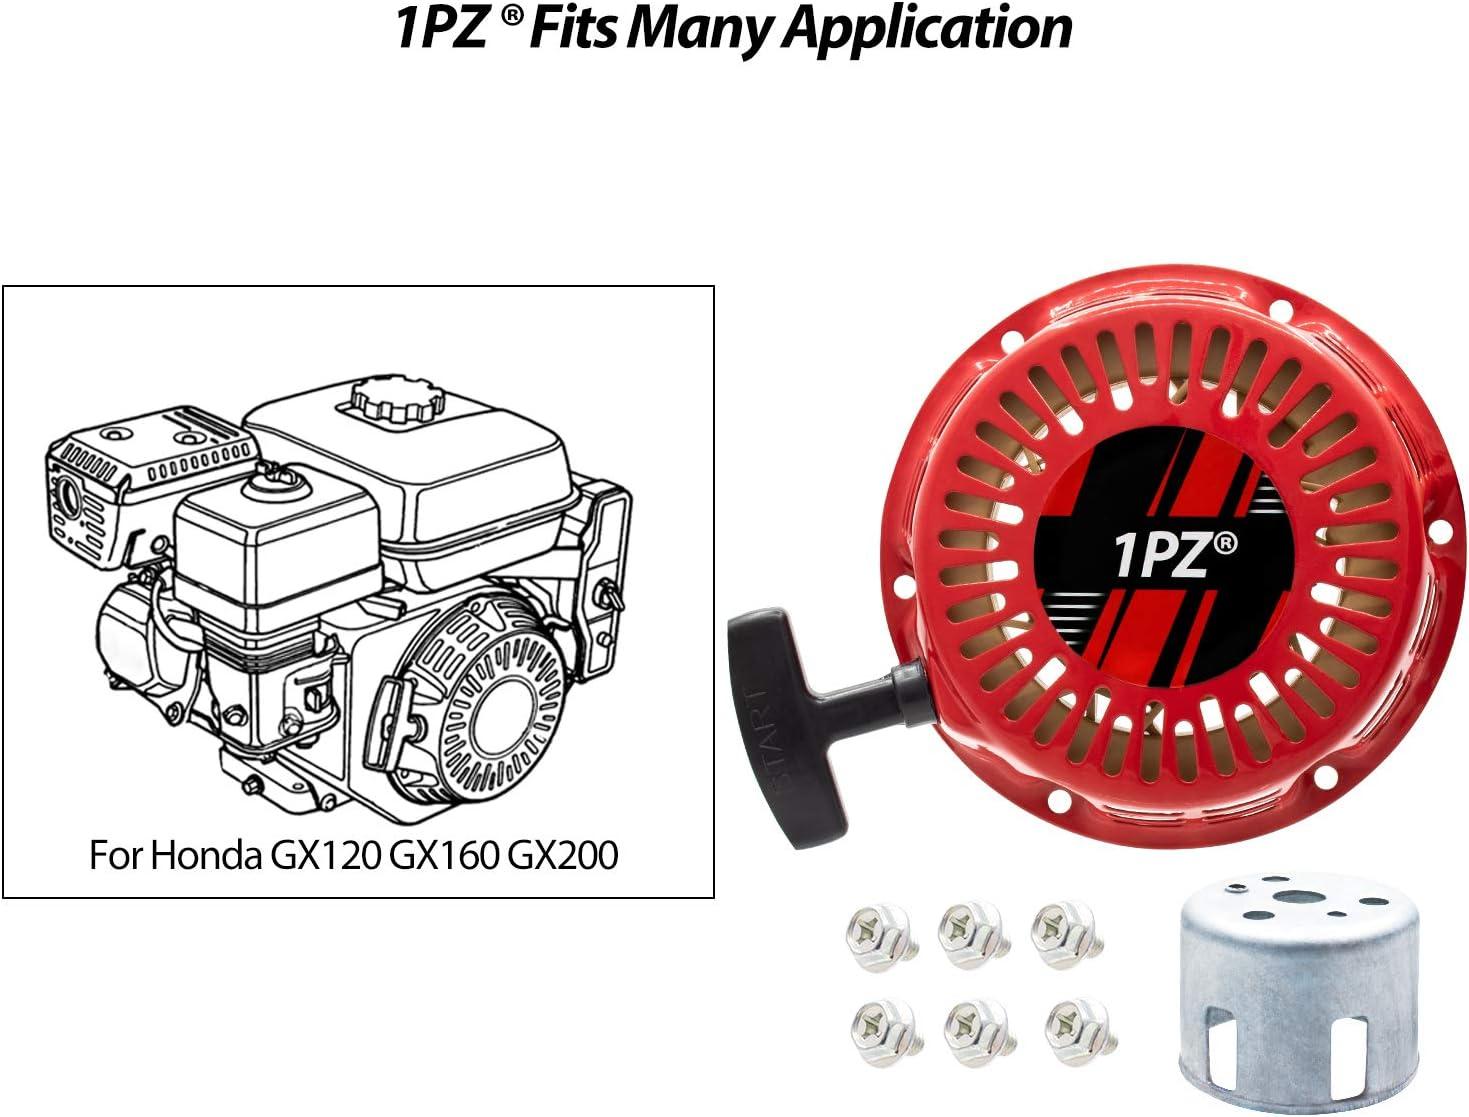 1PZ BA5-W02 Pull Recoil Starter Start Assembly for Coleman CT200U Trail 200 196cc Mini bike Parts